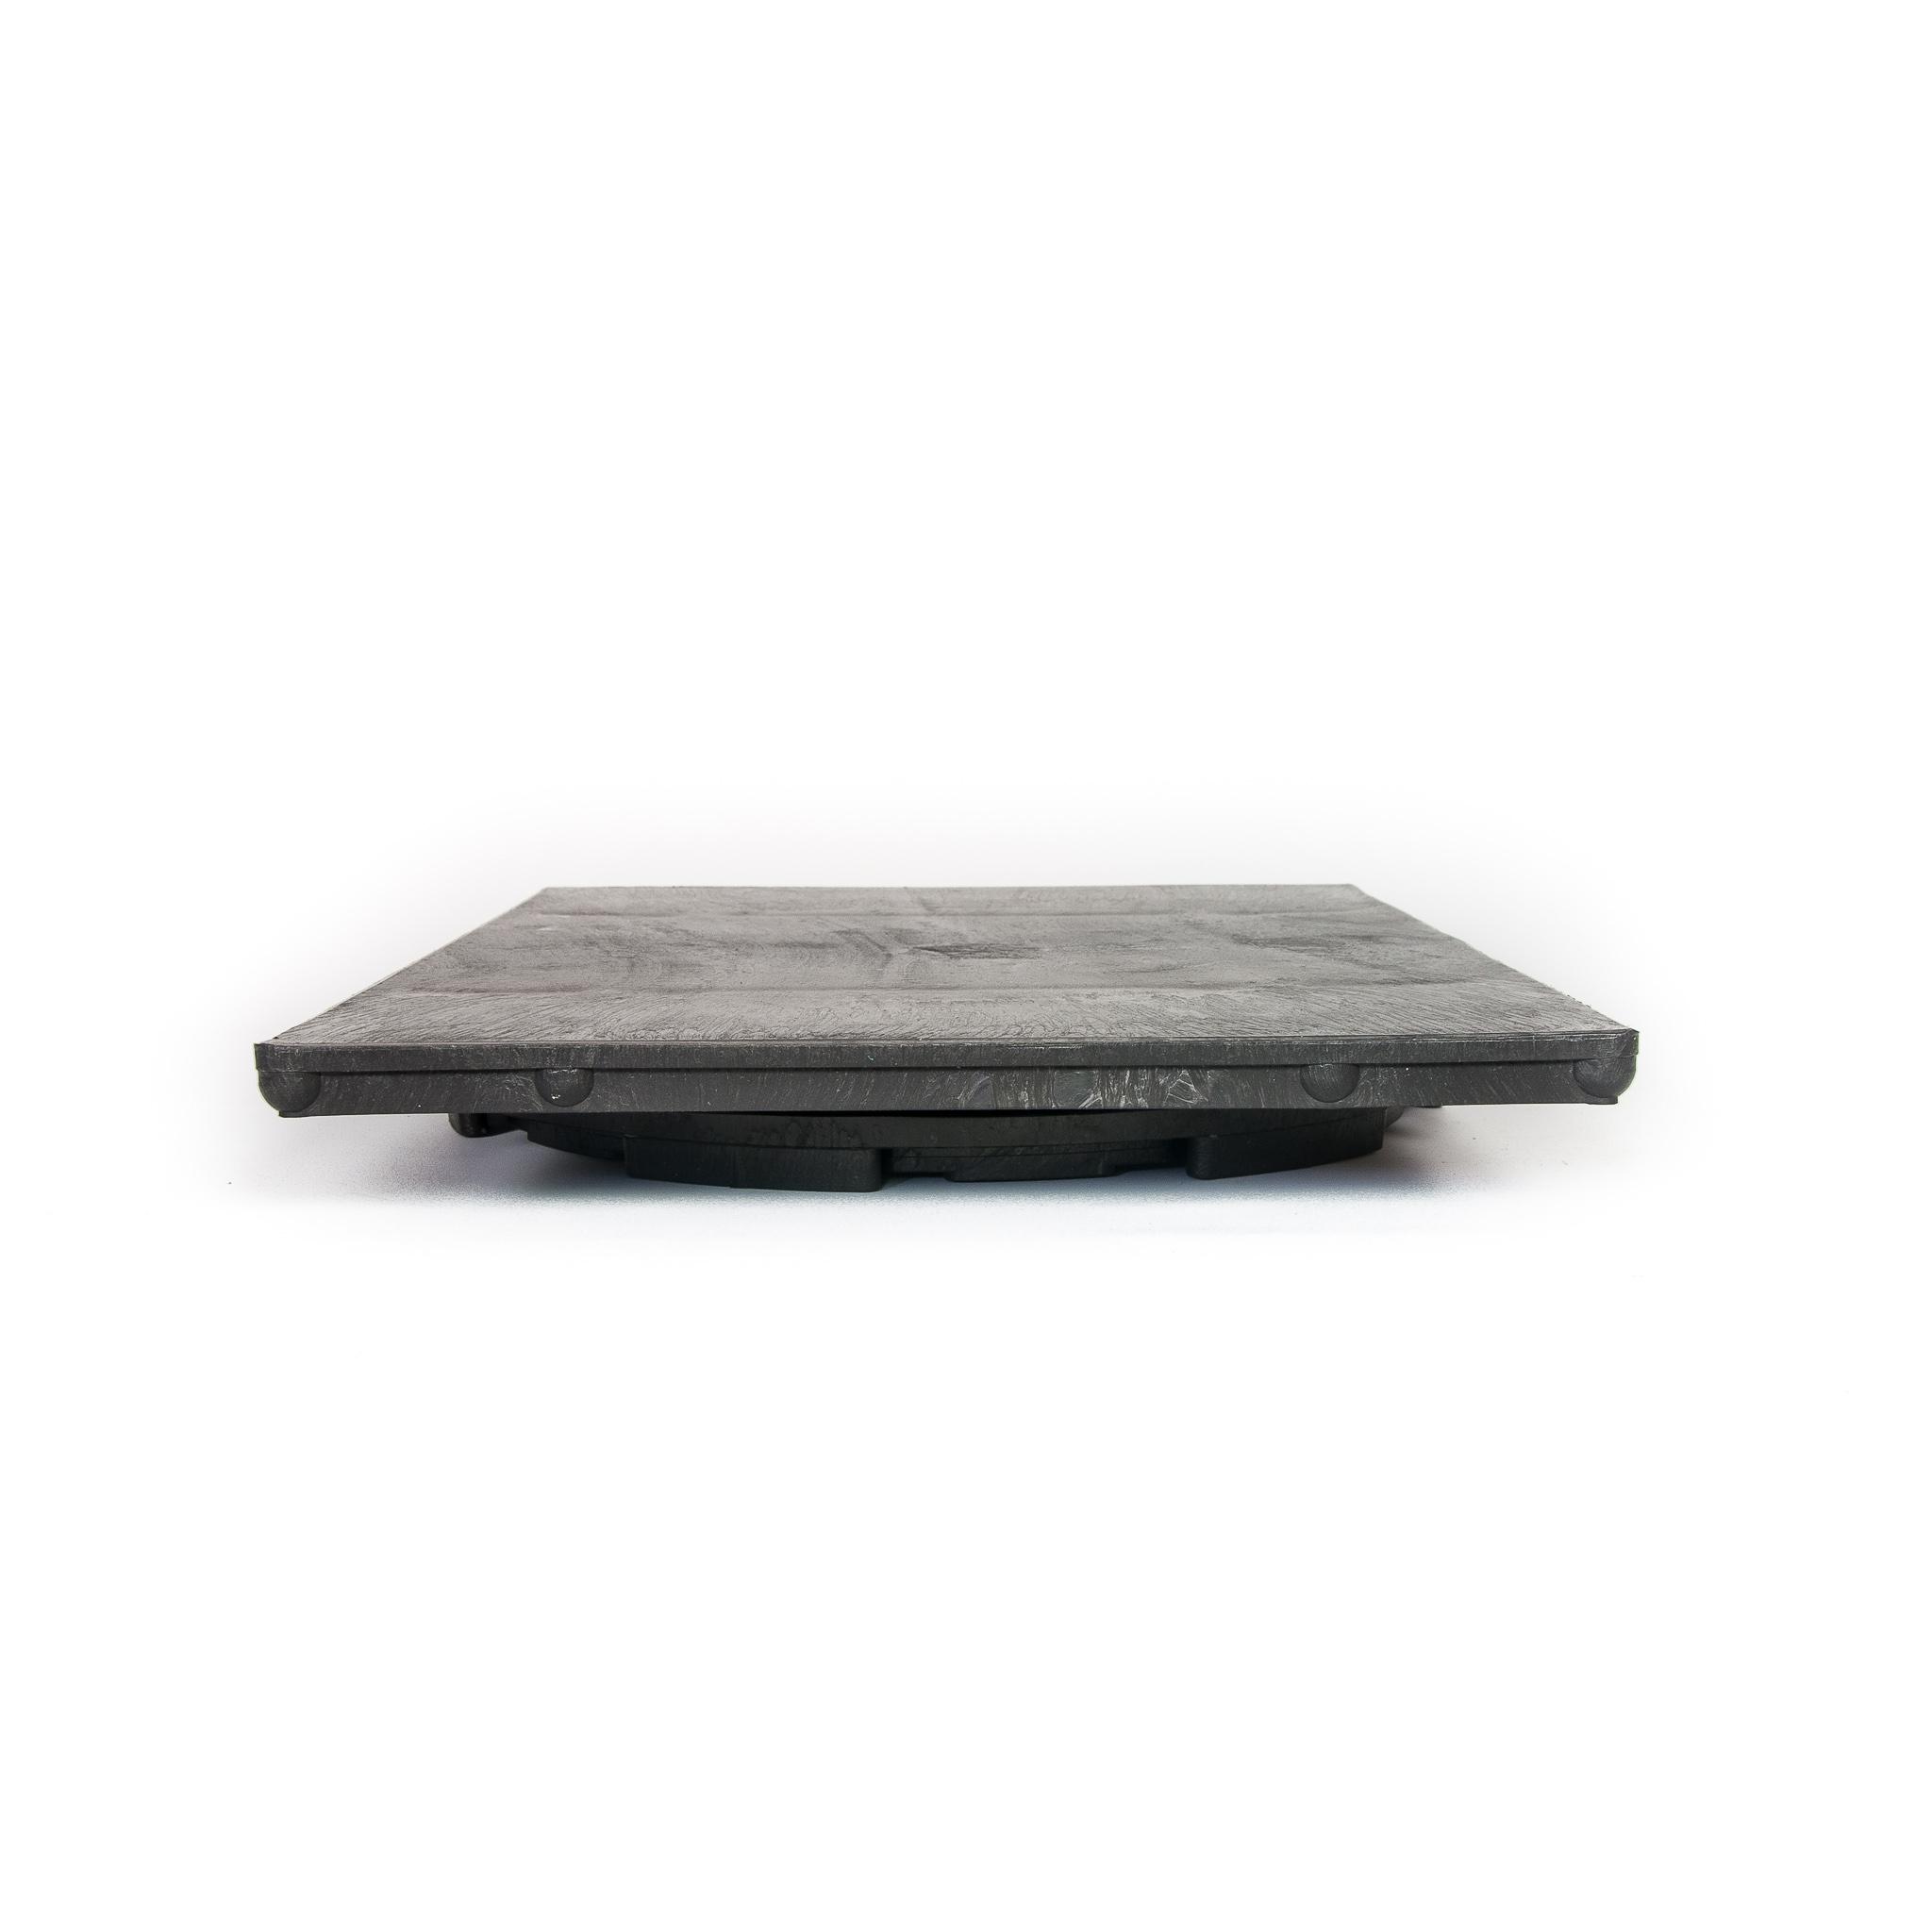 Torno de Bonsai Rectangular 60 cm x 40 cm